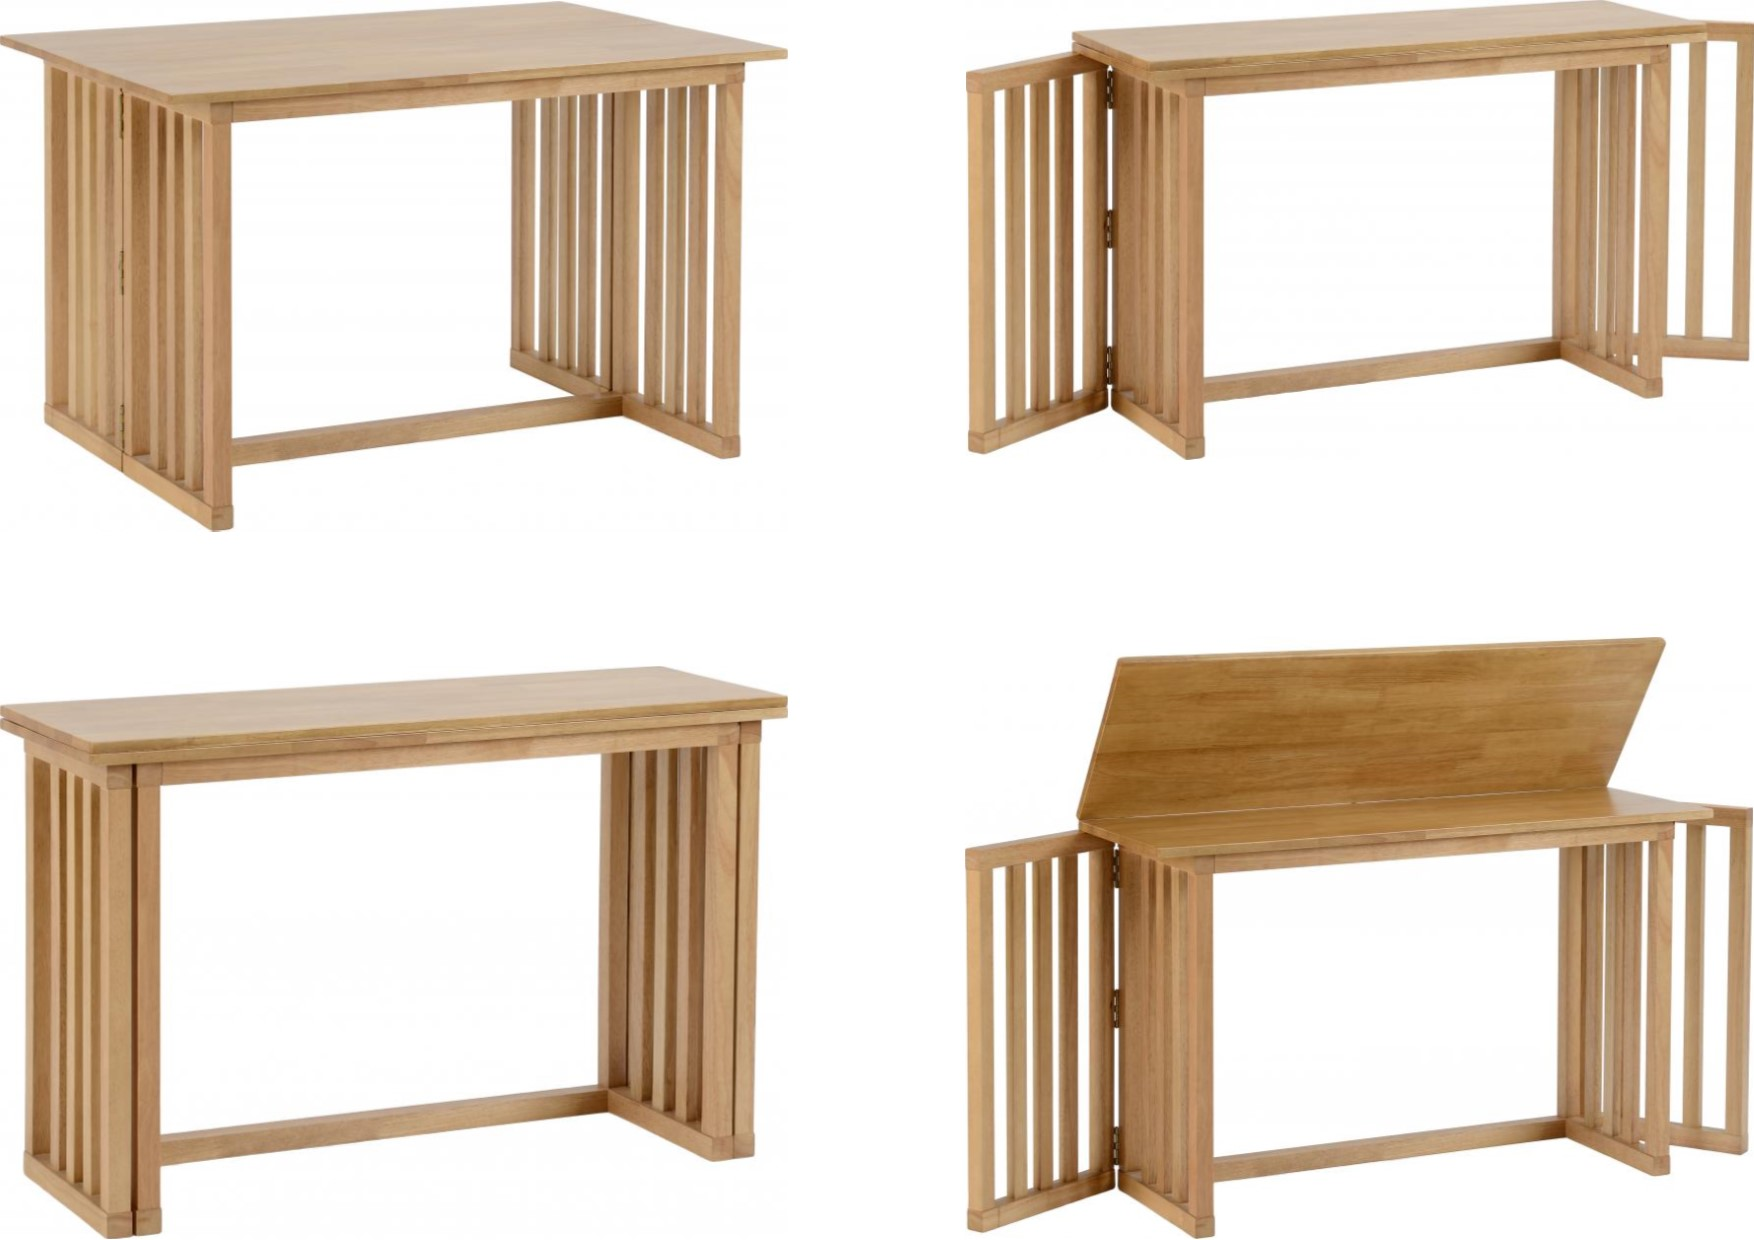 Details About Richmond Foldaway Dining Table E Saving Multi Purpose Slatted Oak Varnish